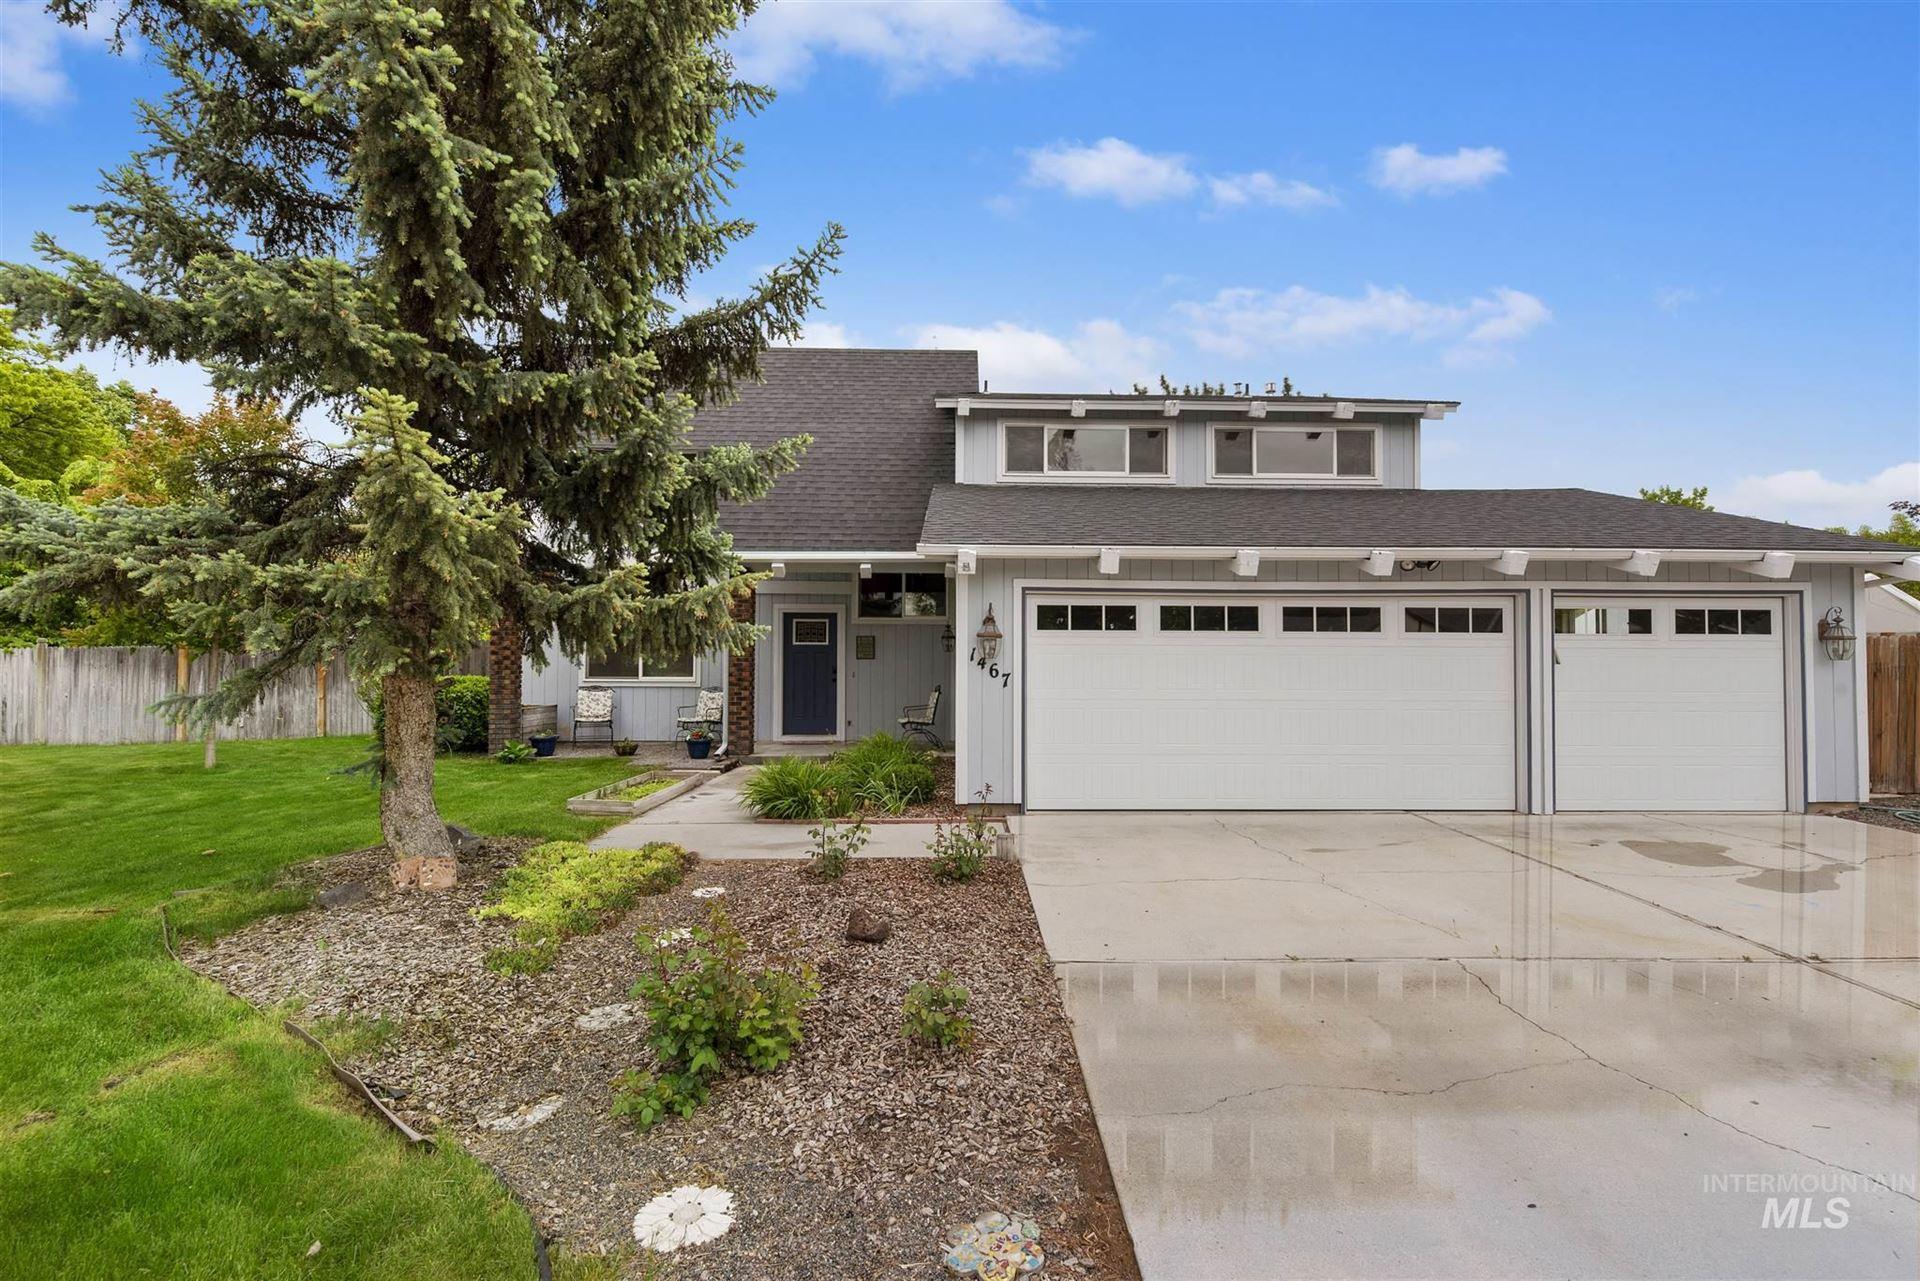 1467 S Whipoorwill Way, Boise, ID 83709-1368 - MLS#: 98767778